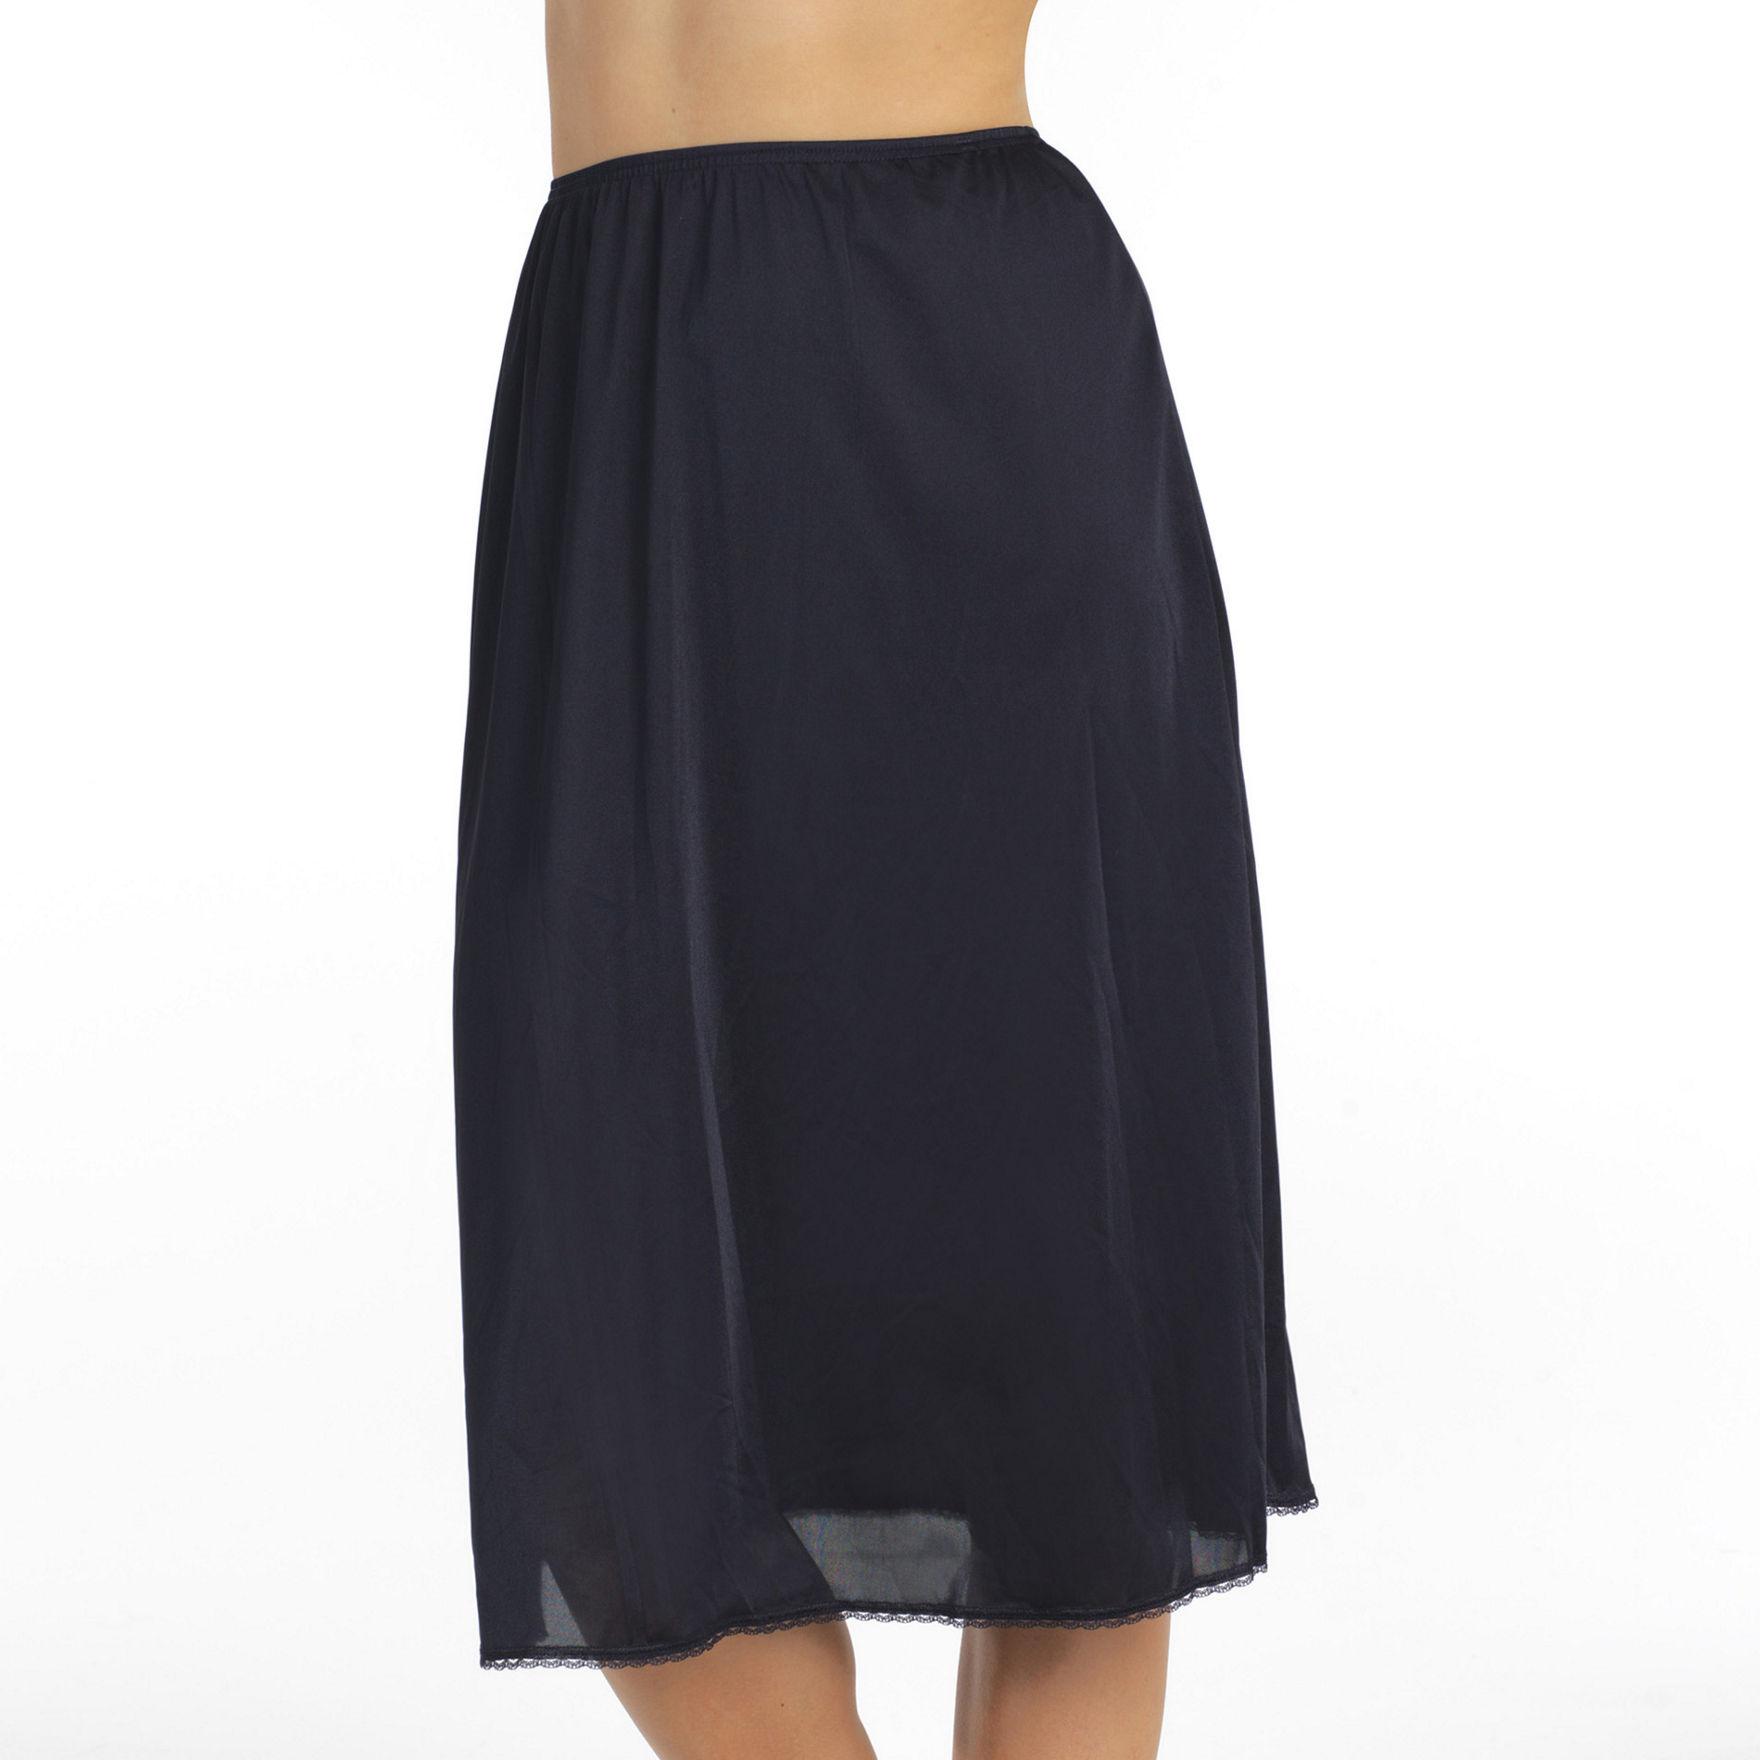 Vanity Fair Black Slips & Shapewear